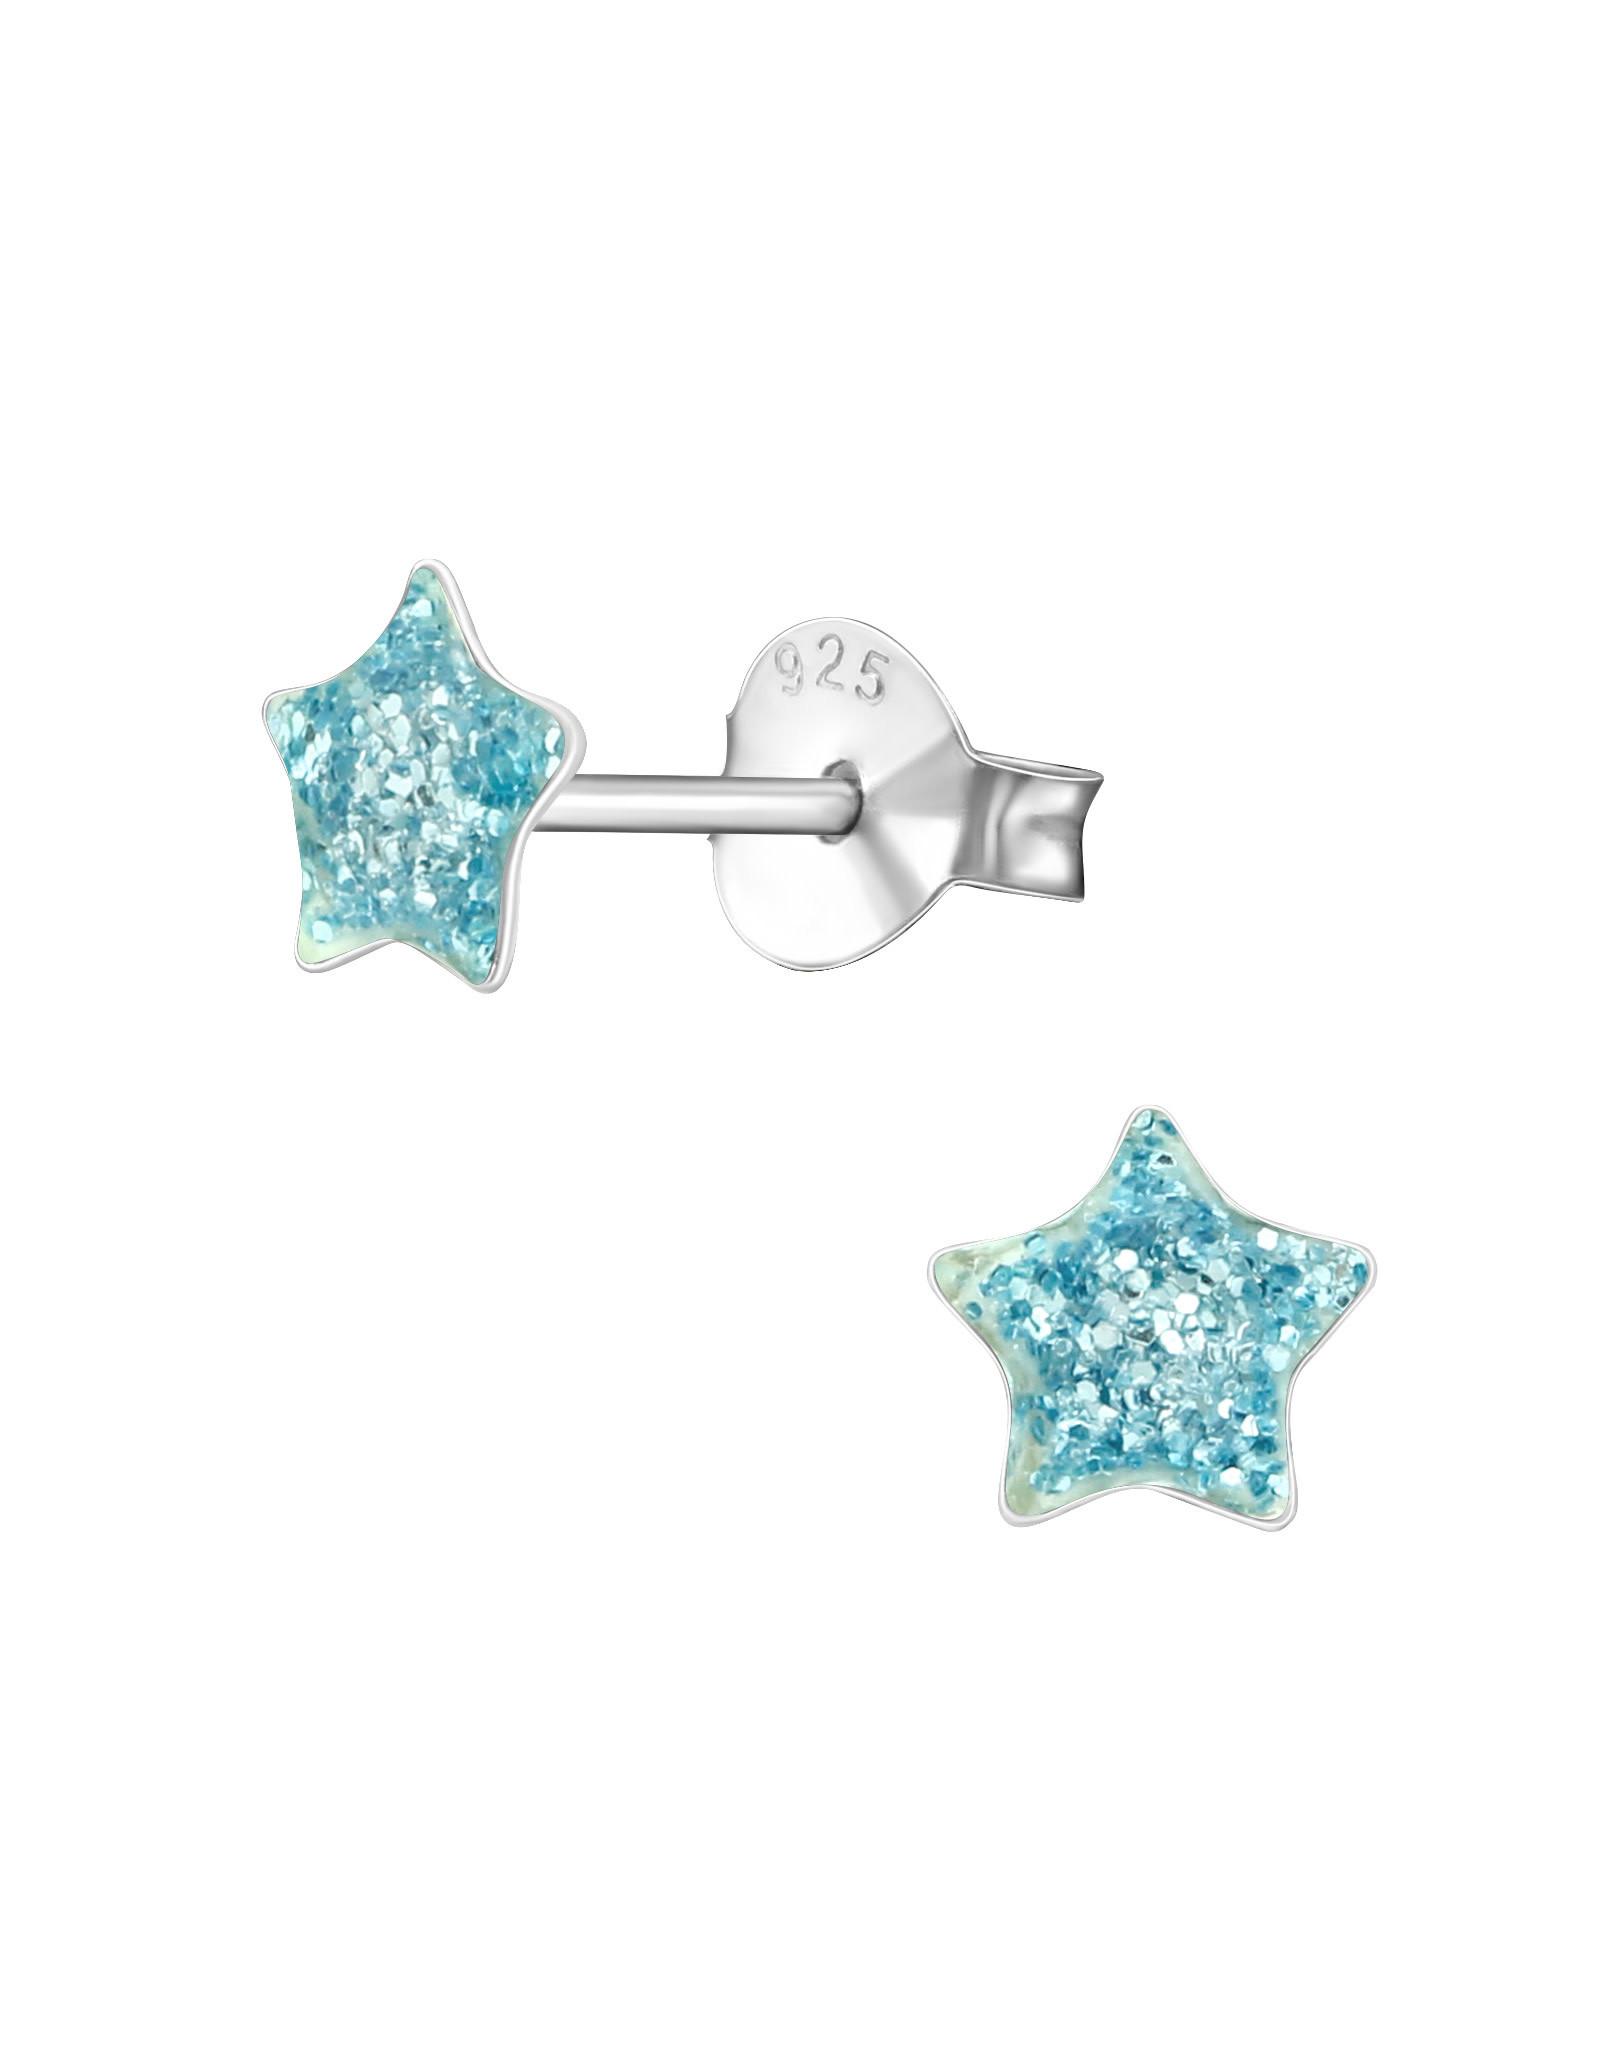 Stekertjes zilver ster glitter turquoise